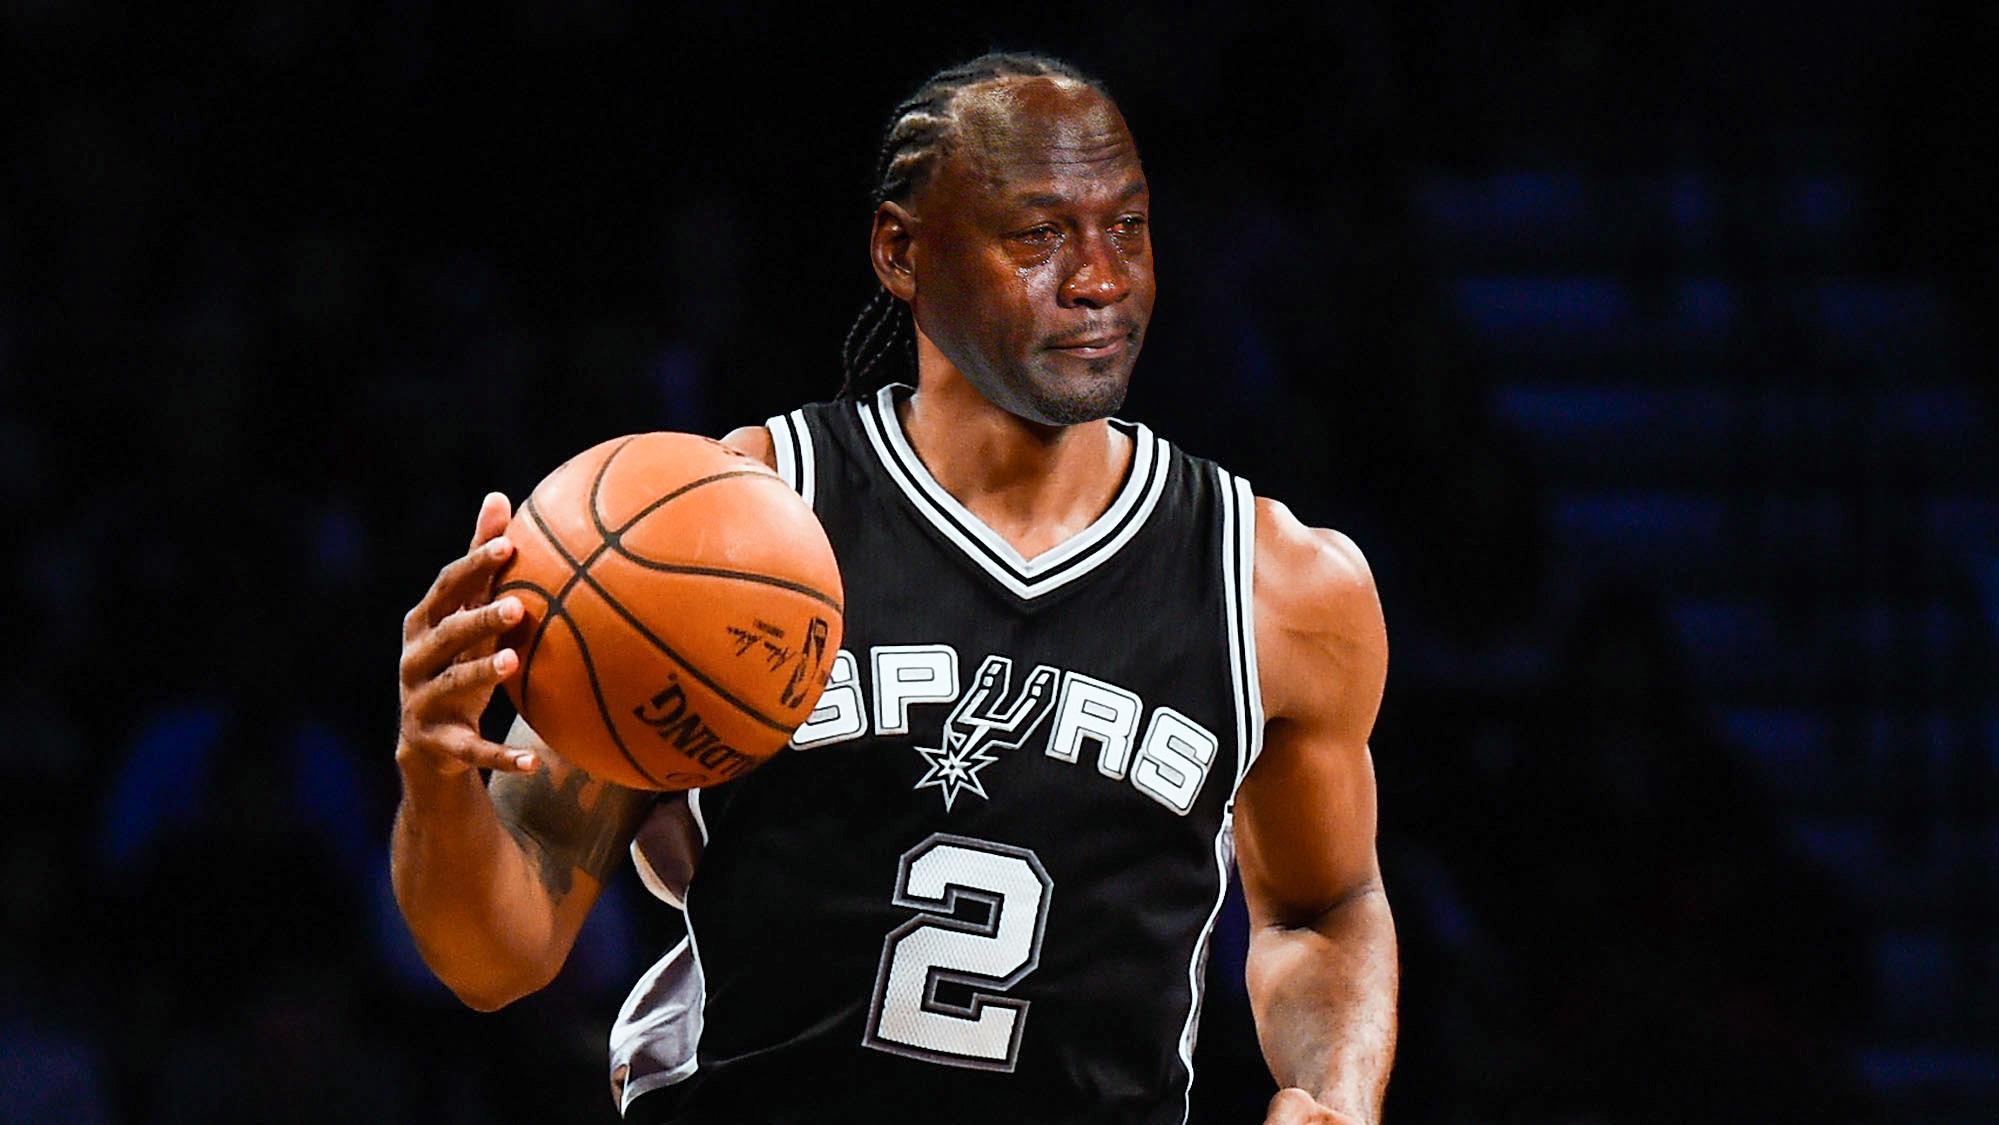 Crying Jordan meme